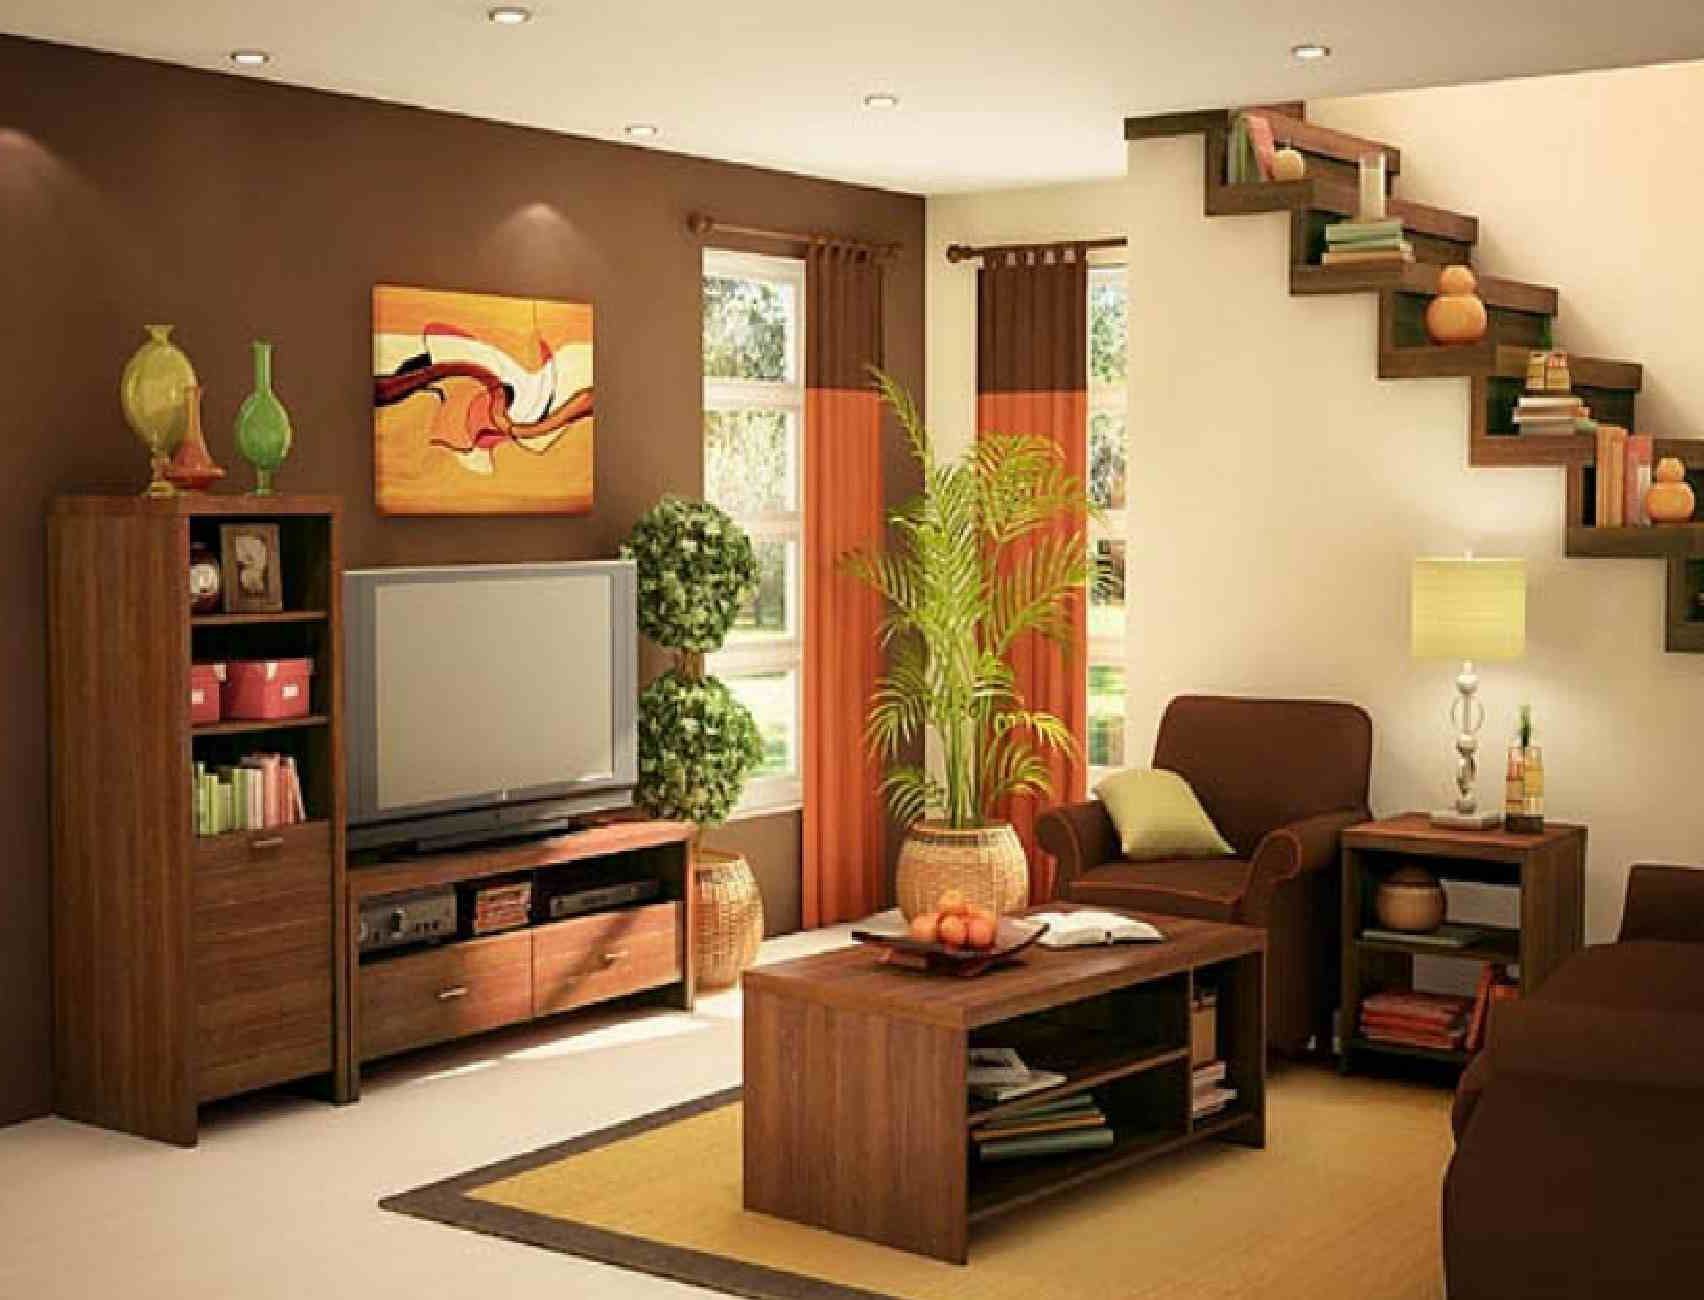 30 Minimalist Living Room Ideas Inspiration To Make The Mos